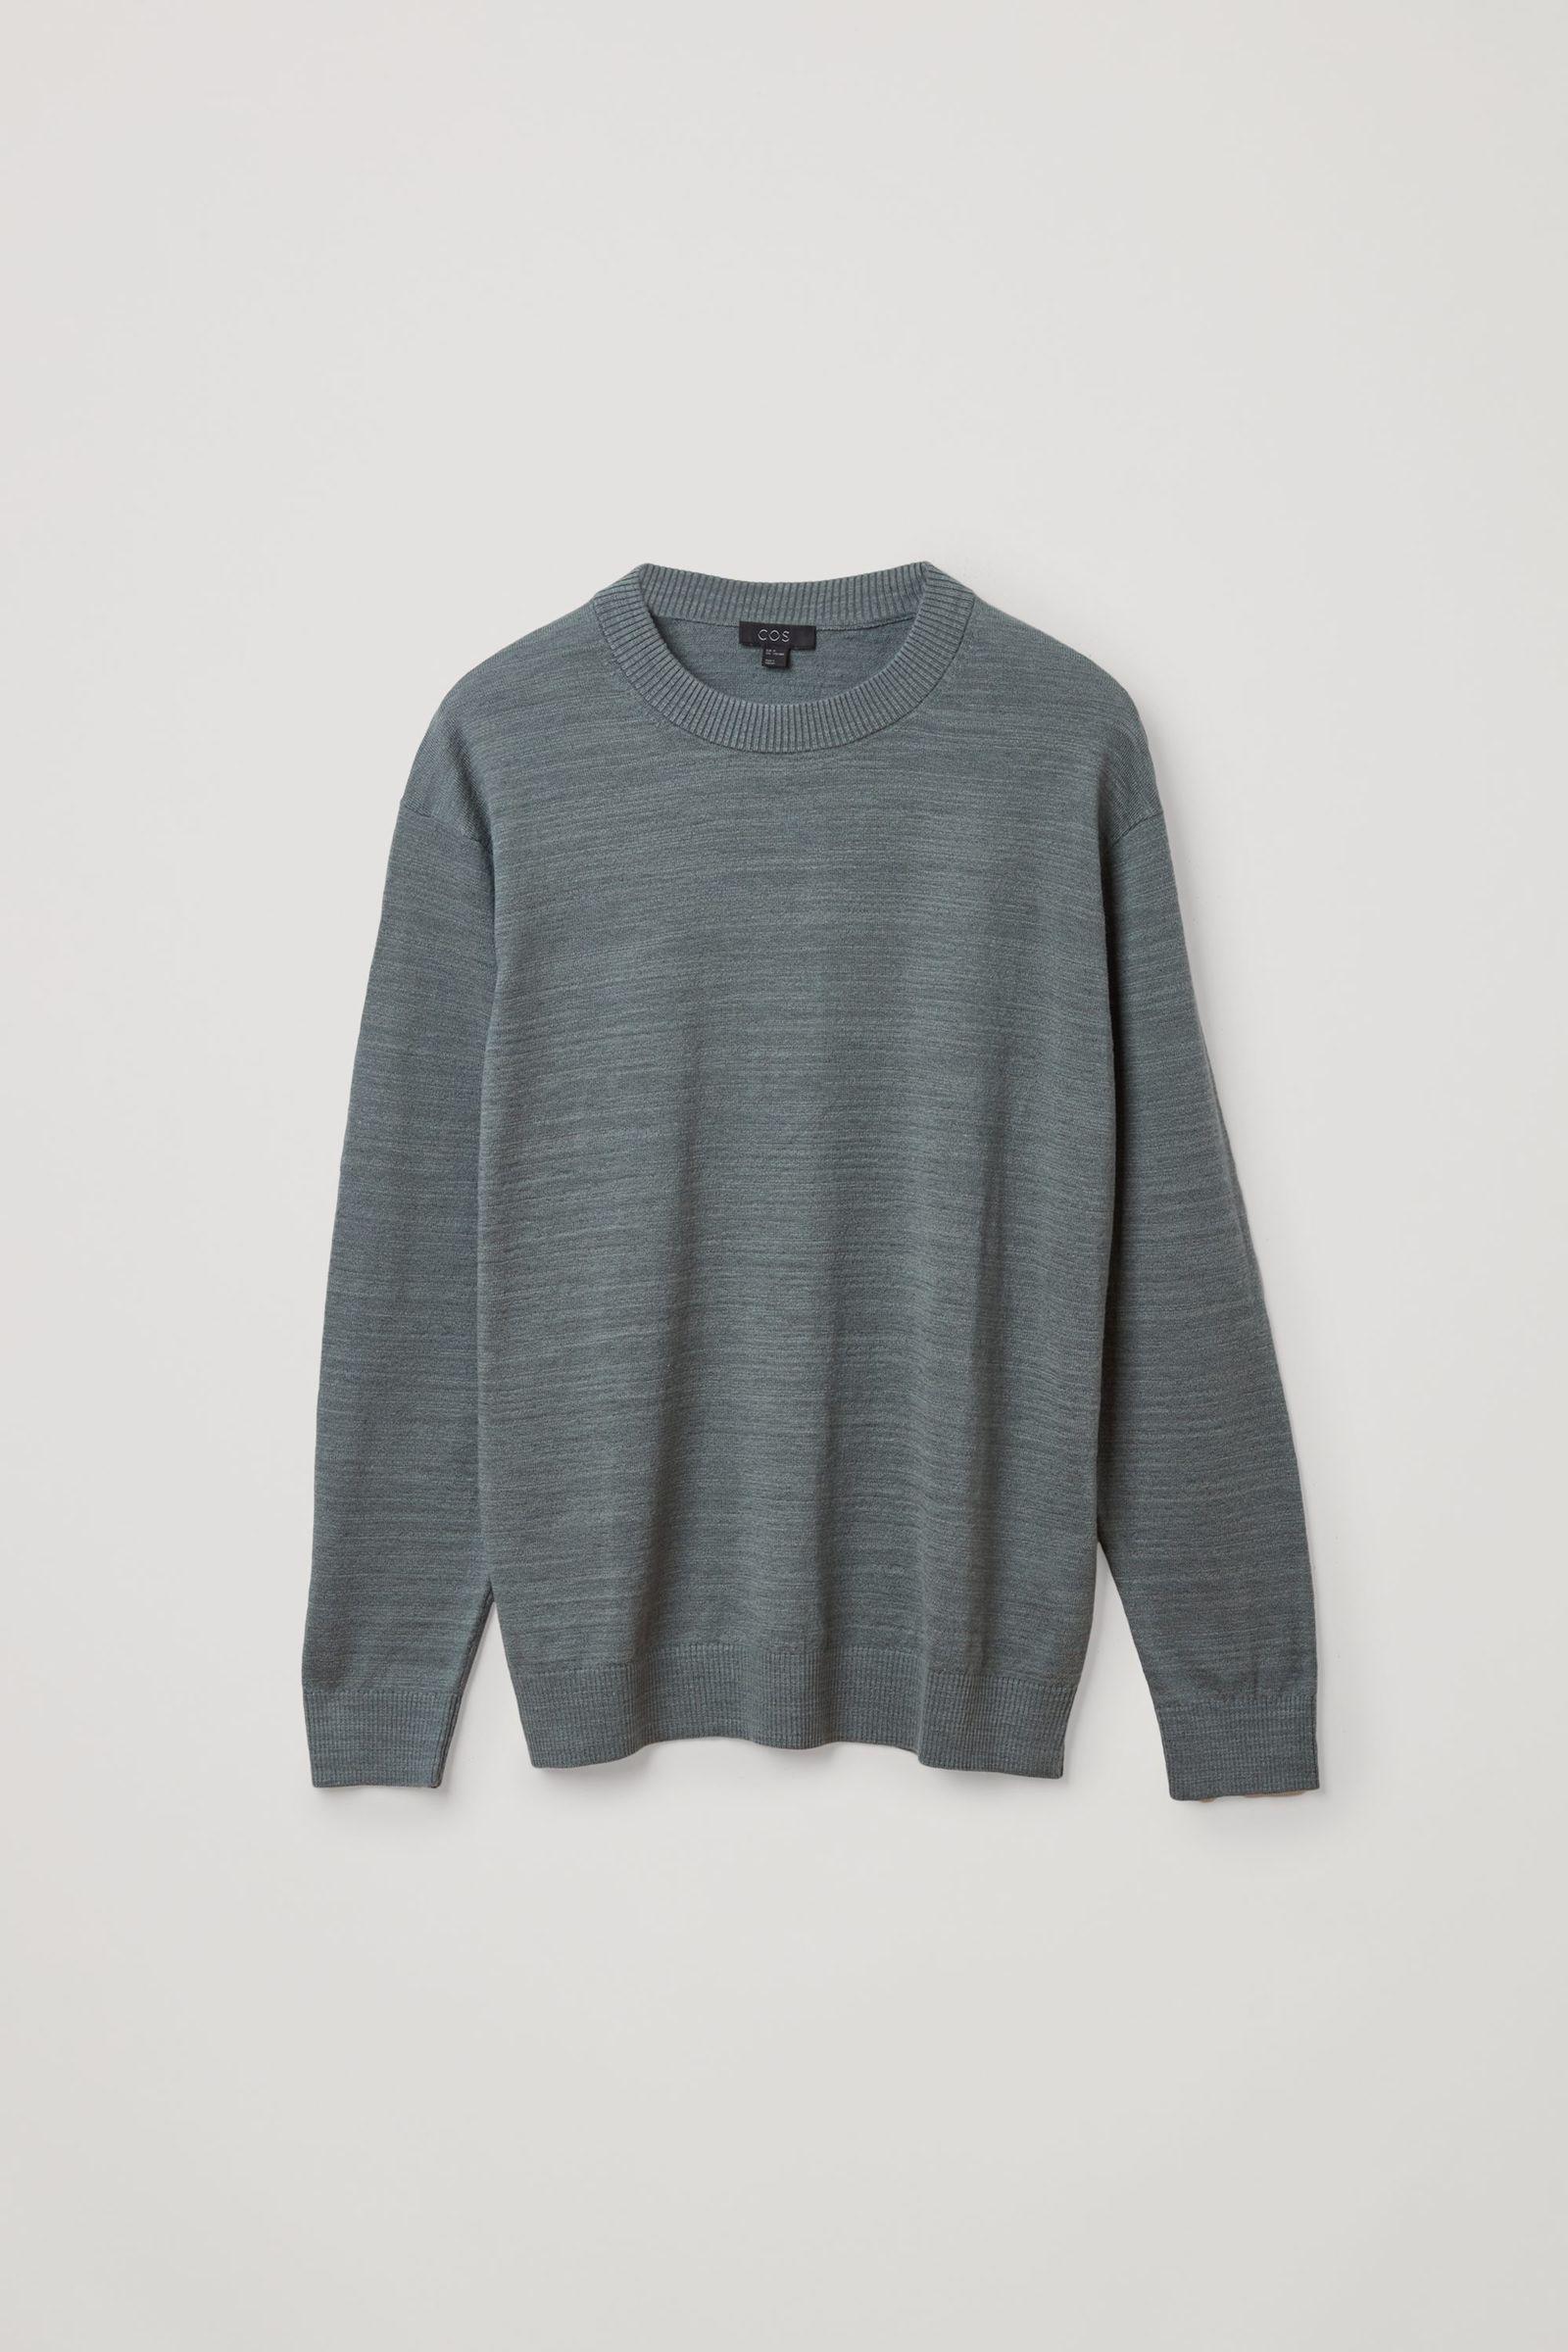 COS 릴랙스드 리넨 코튼 스웨터의 그린컬러 Product입니다.